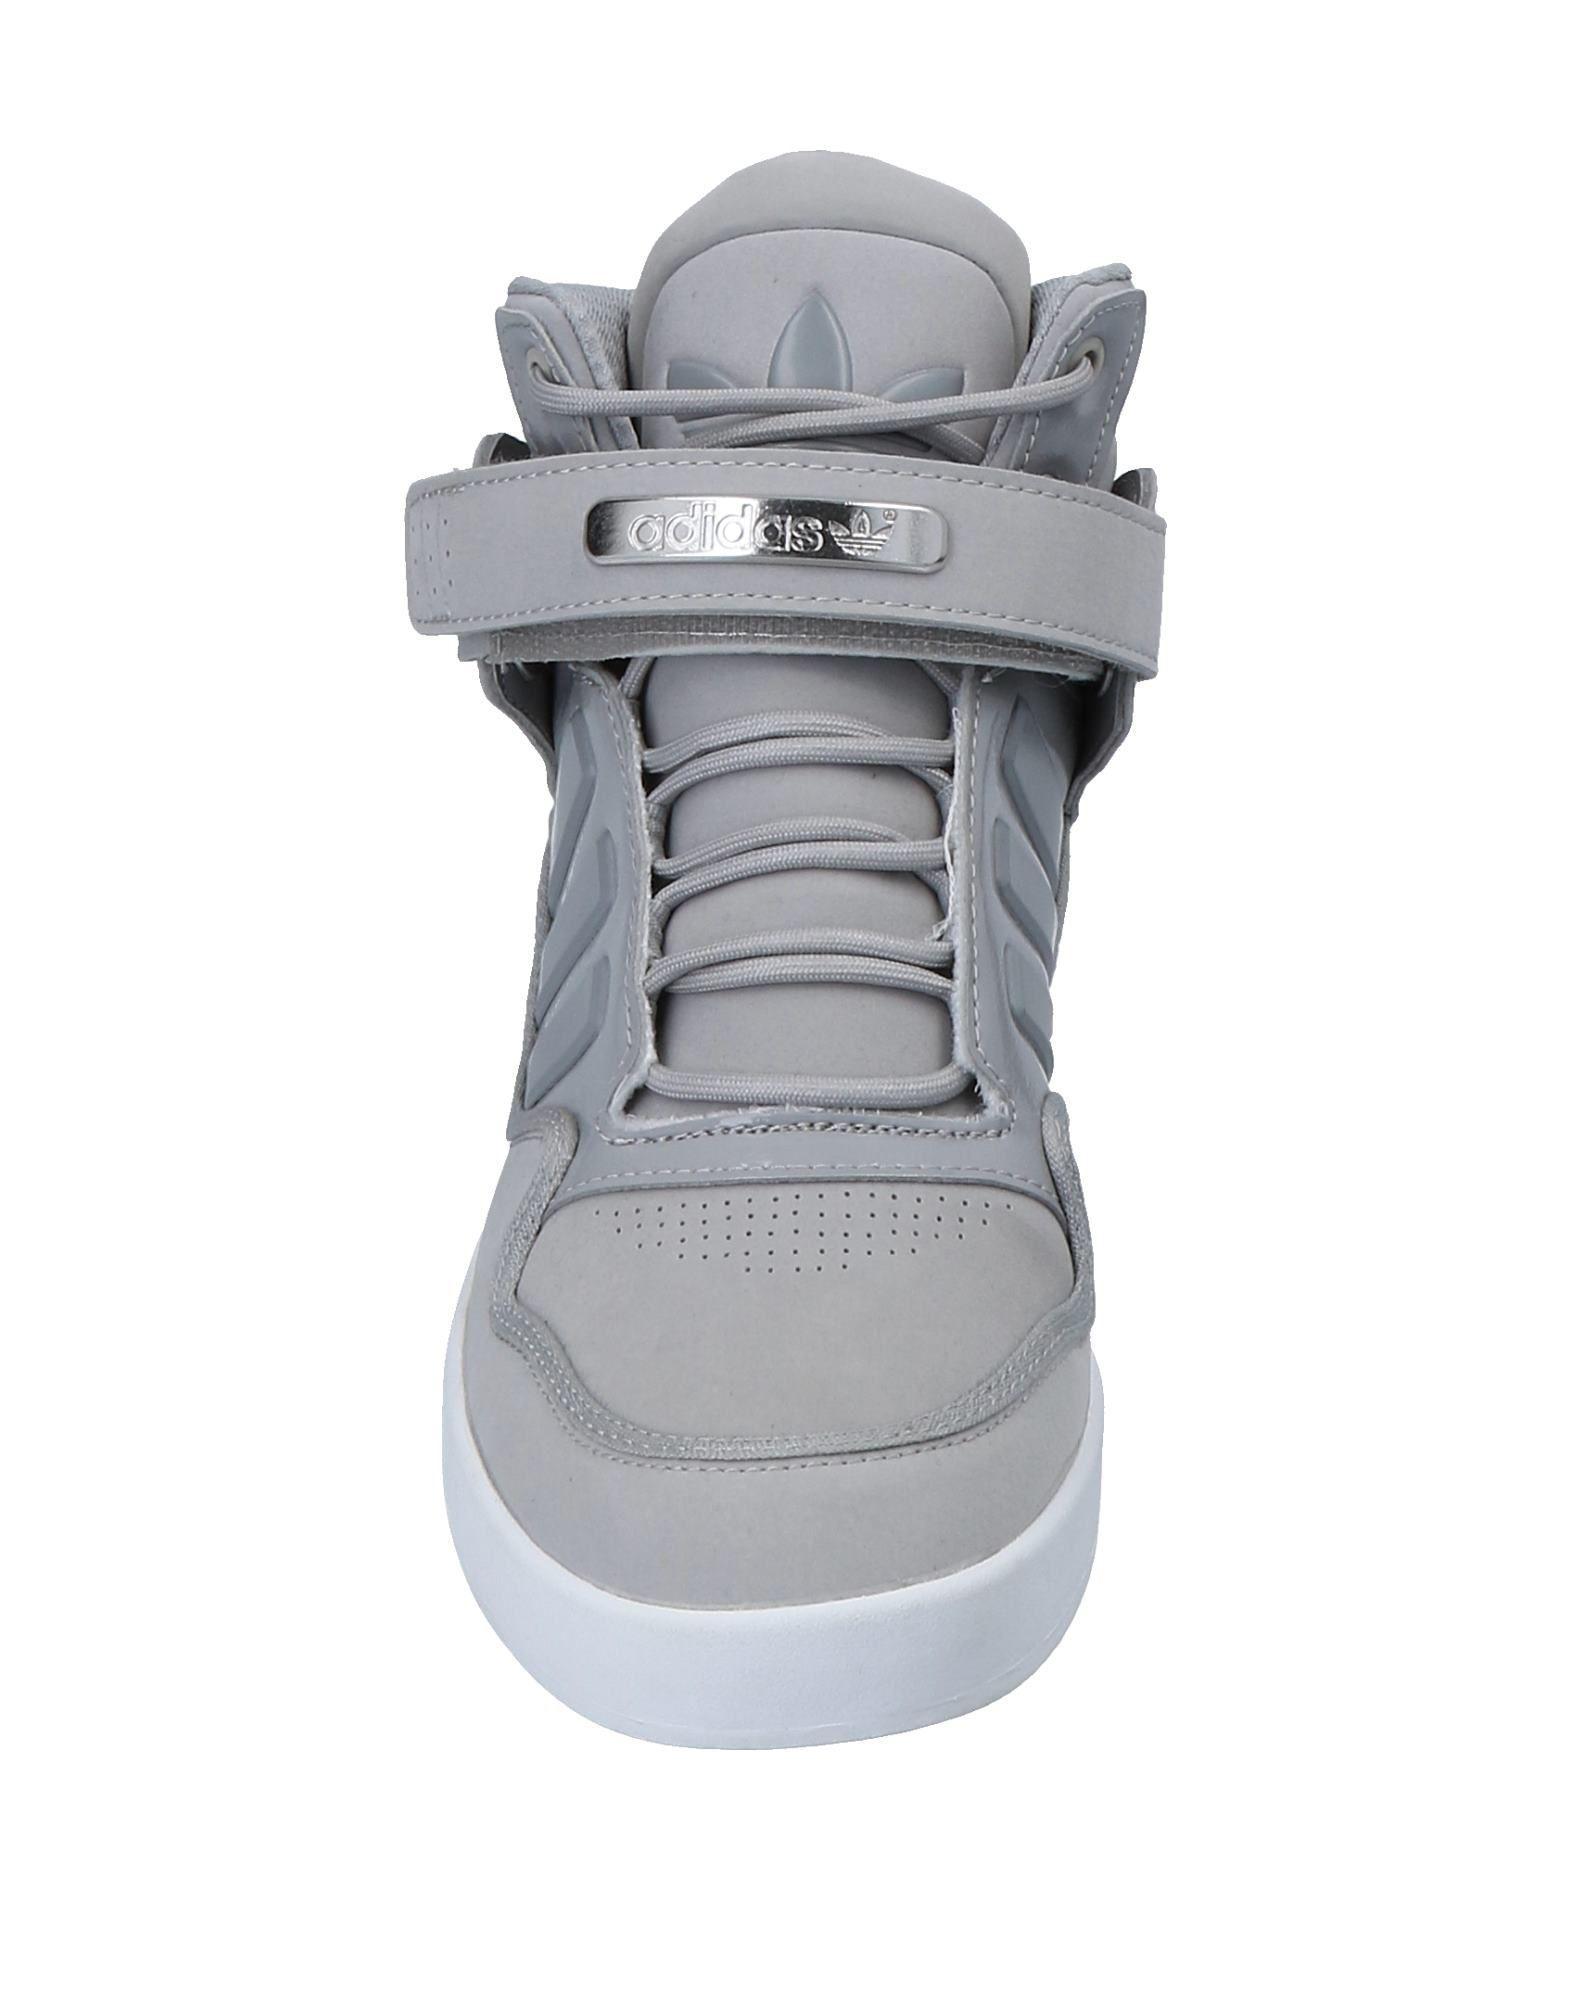 adidas Originals Synthetic High-tops